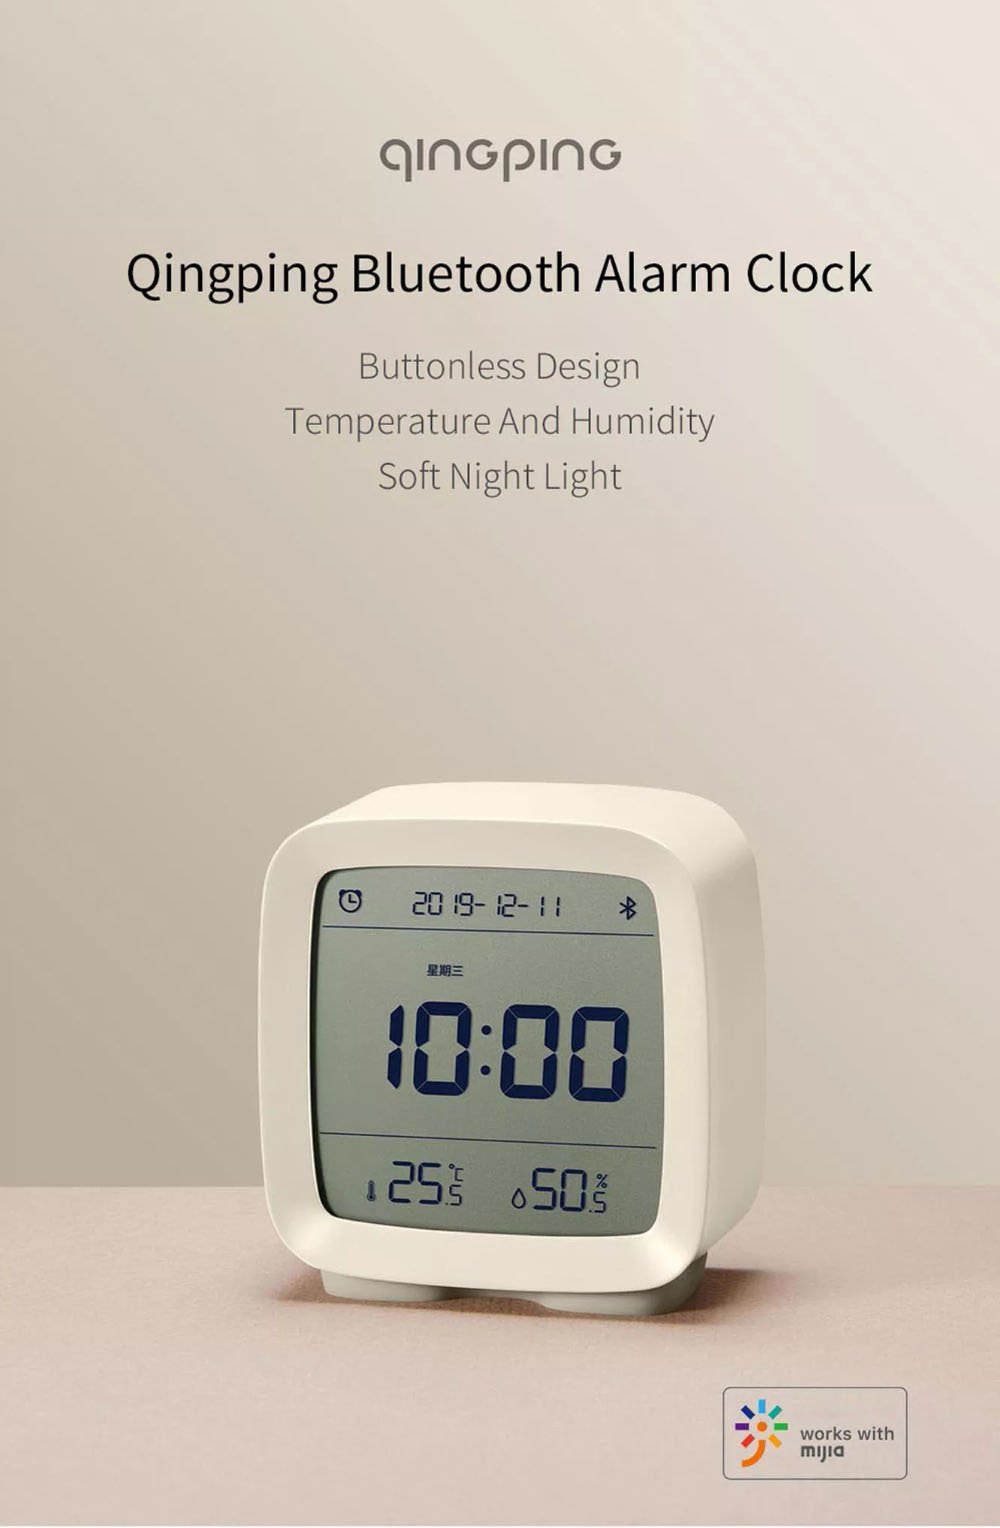 Xiaomi Youpin Qingping Mijia Bluetooth Alarm Clock Alarm Clock Temperature 2